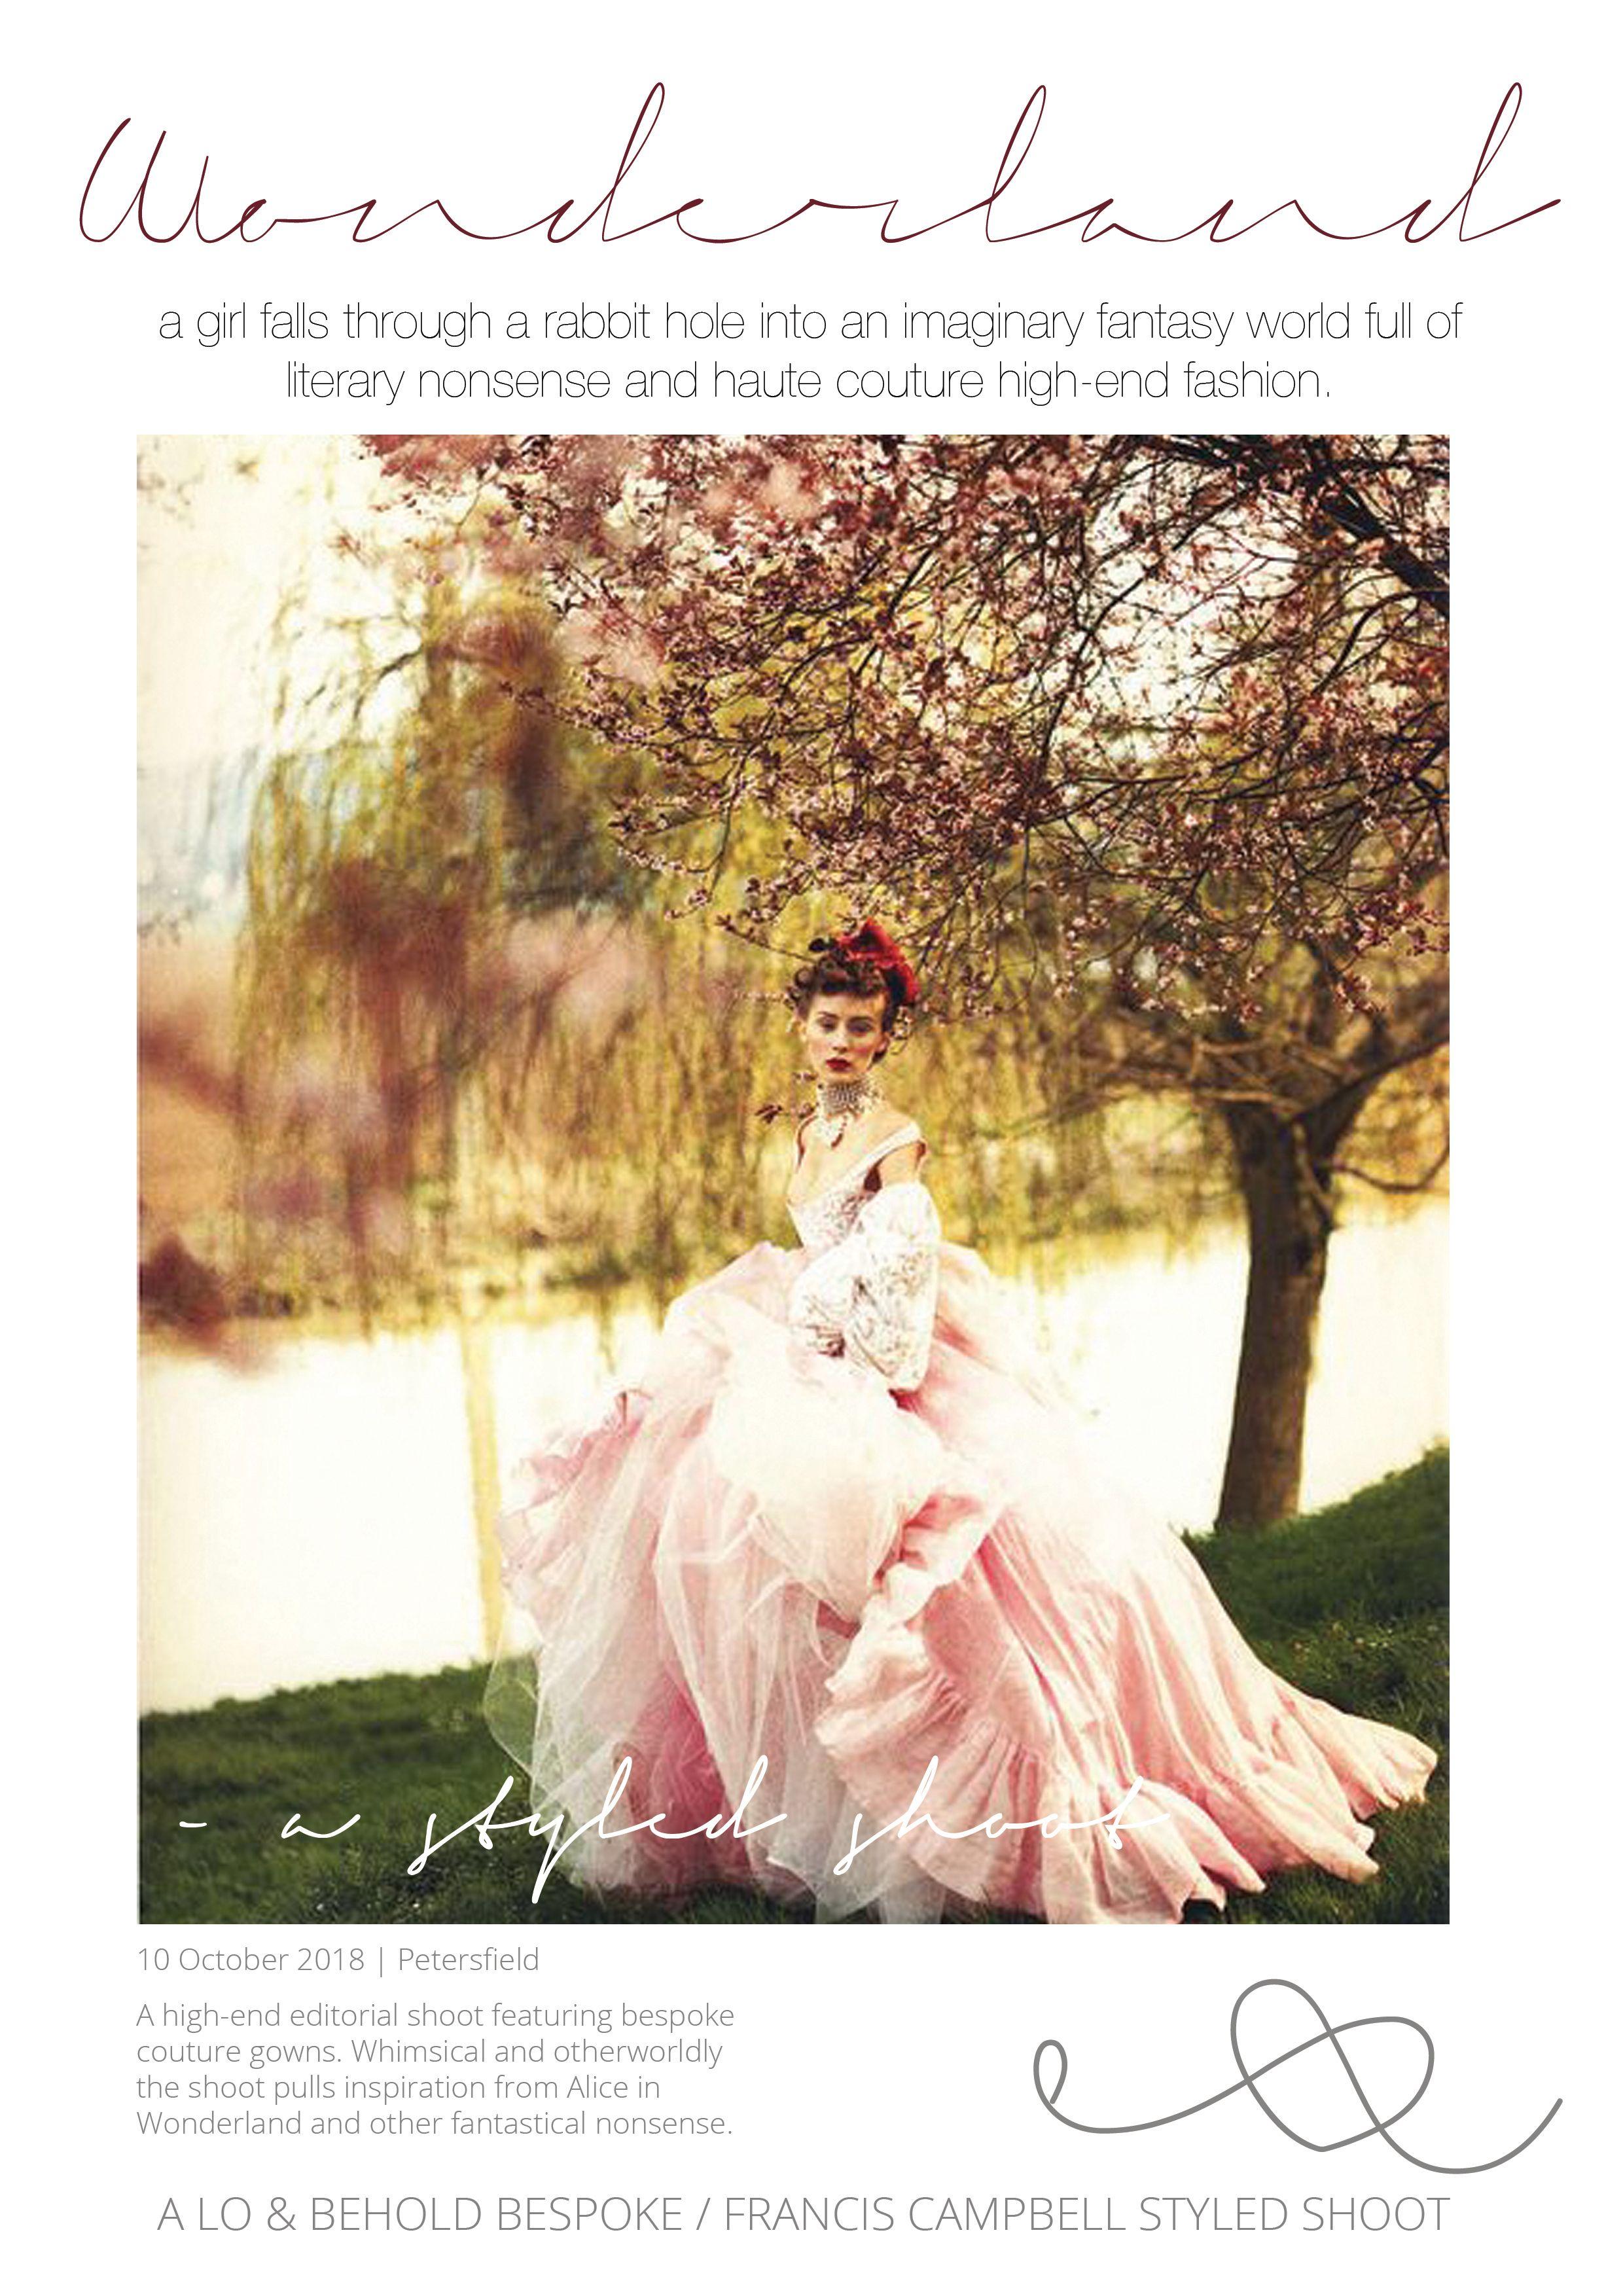 Viking wedding decorations october 2018 Pin by Lo u Behold Bespoke on Wonderland Styled Shoot Inspiration